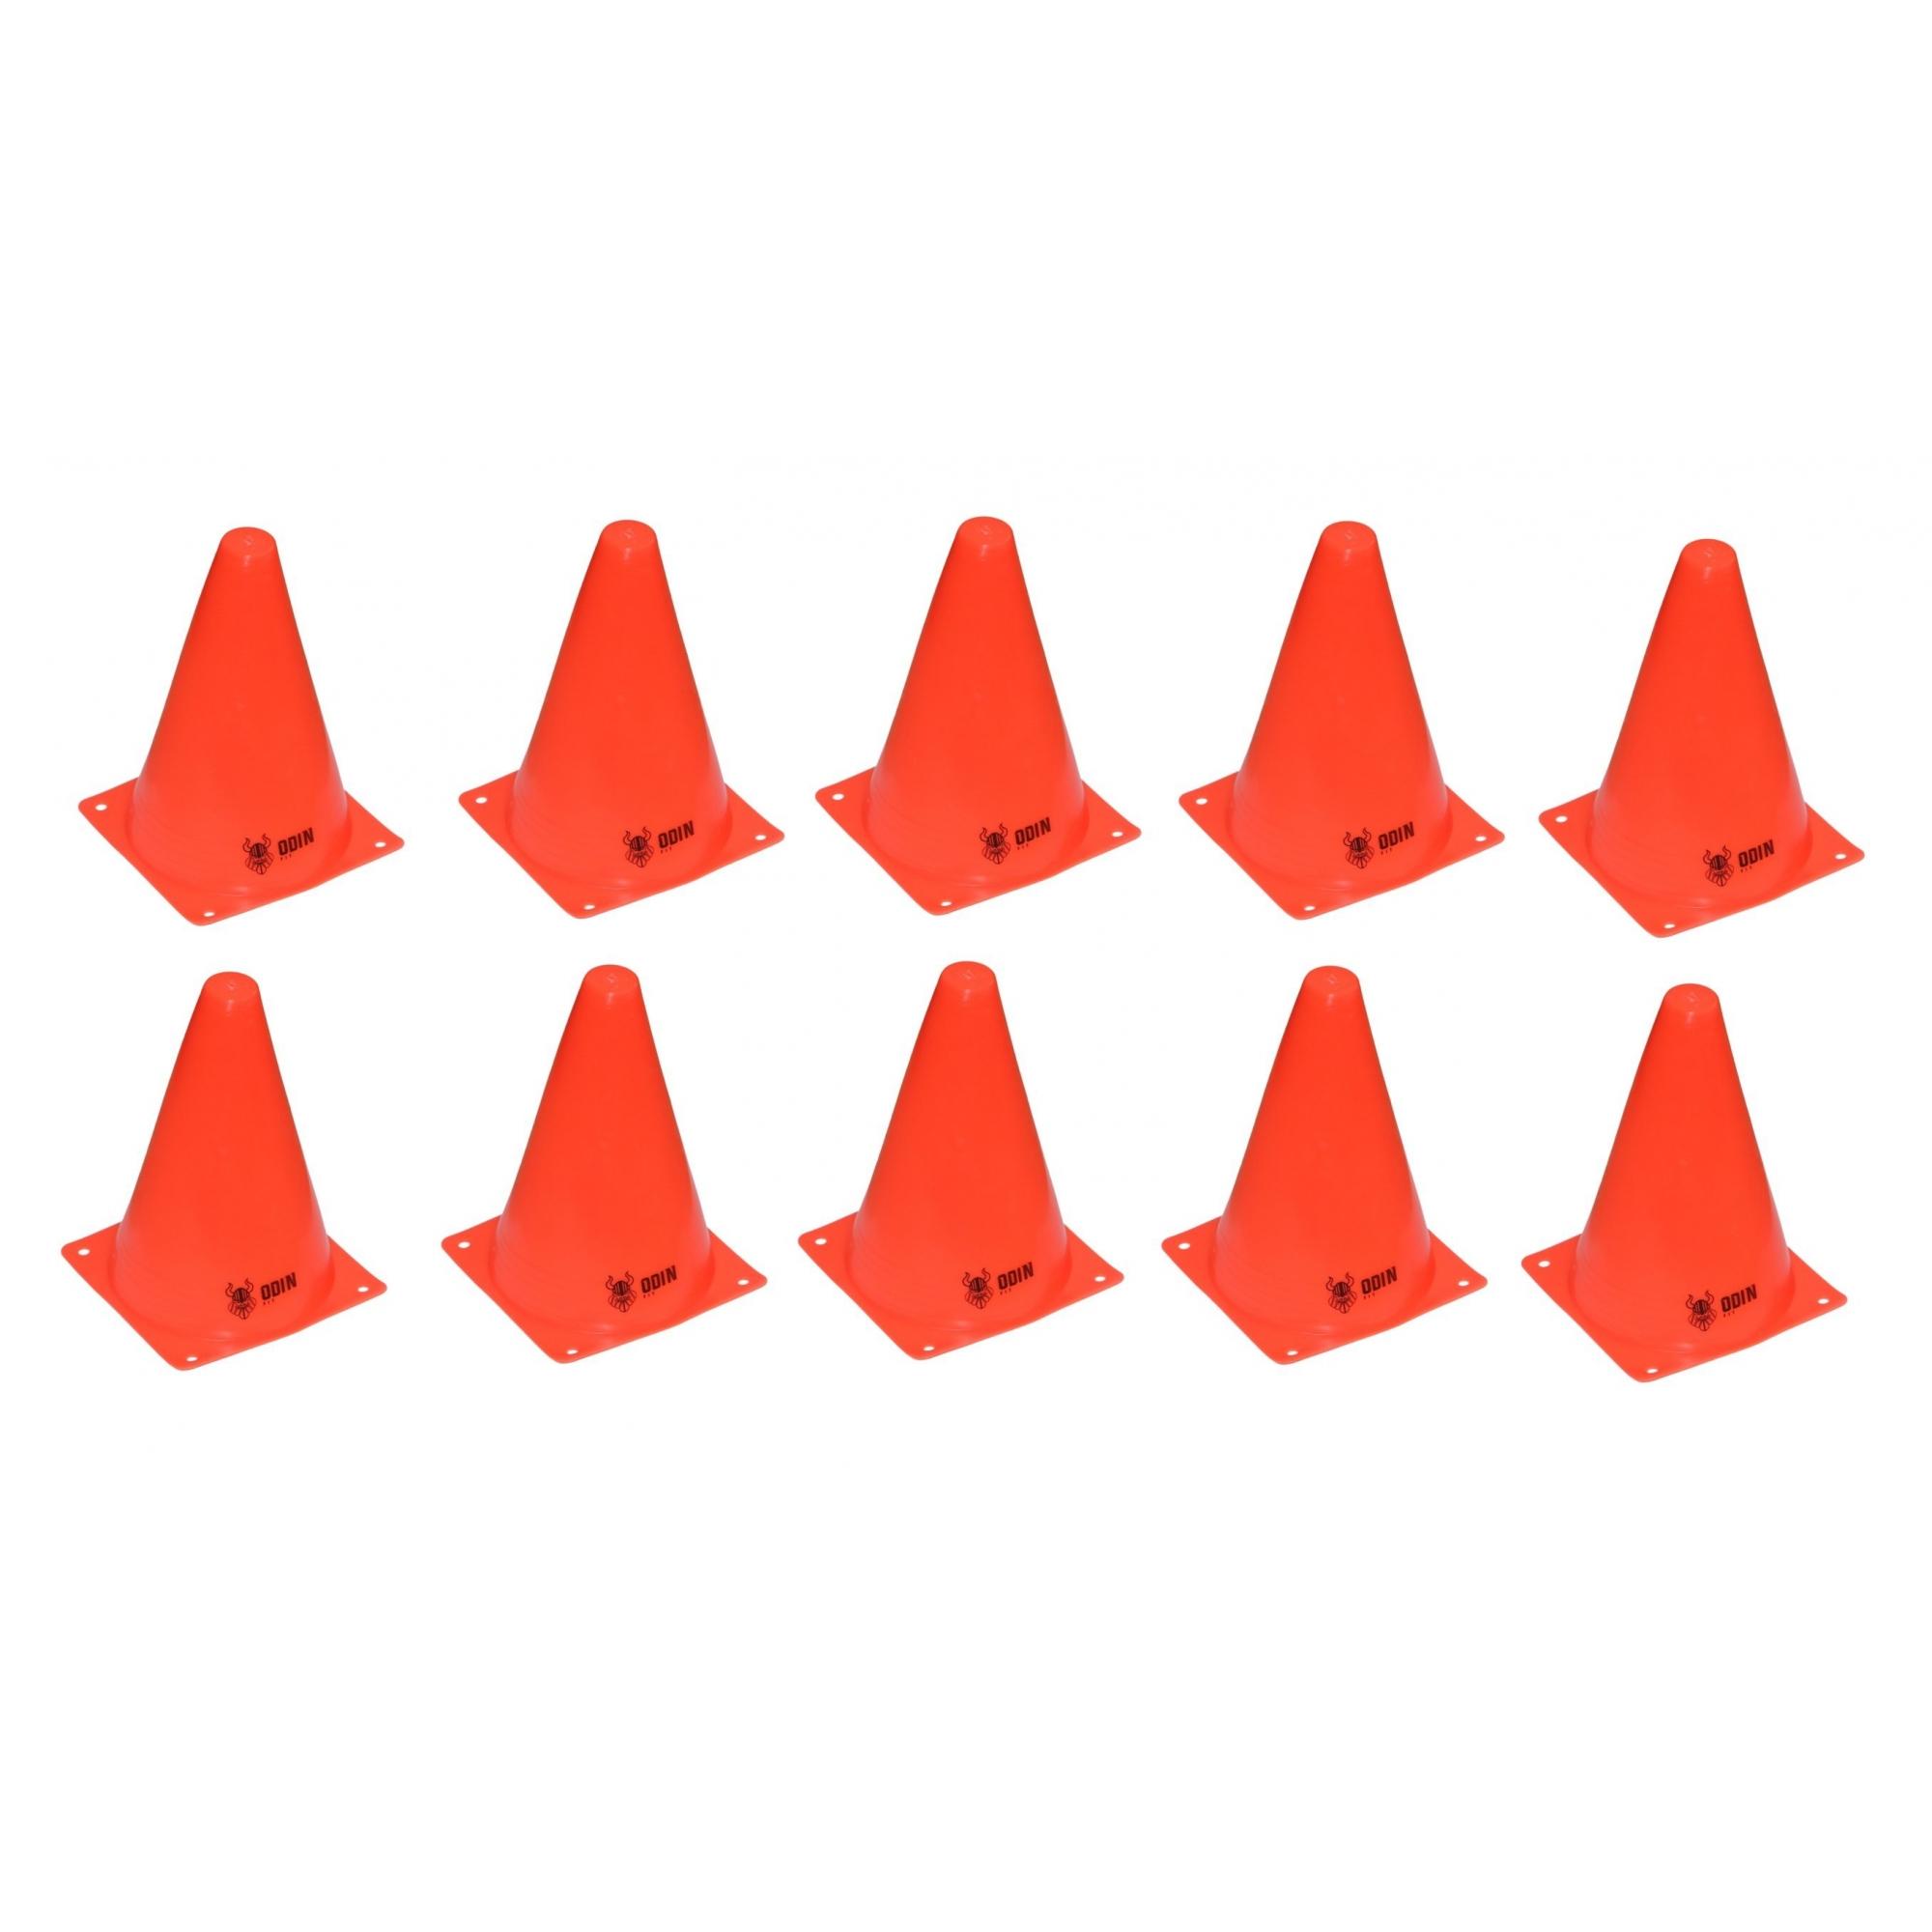 Kit 10 Cones 19cm Treinamento Funcional Agilidade - Odin Fit